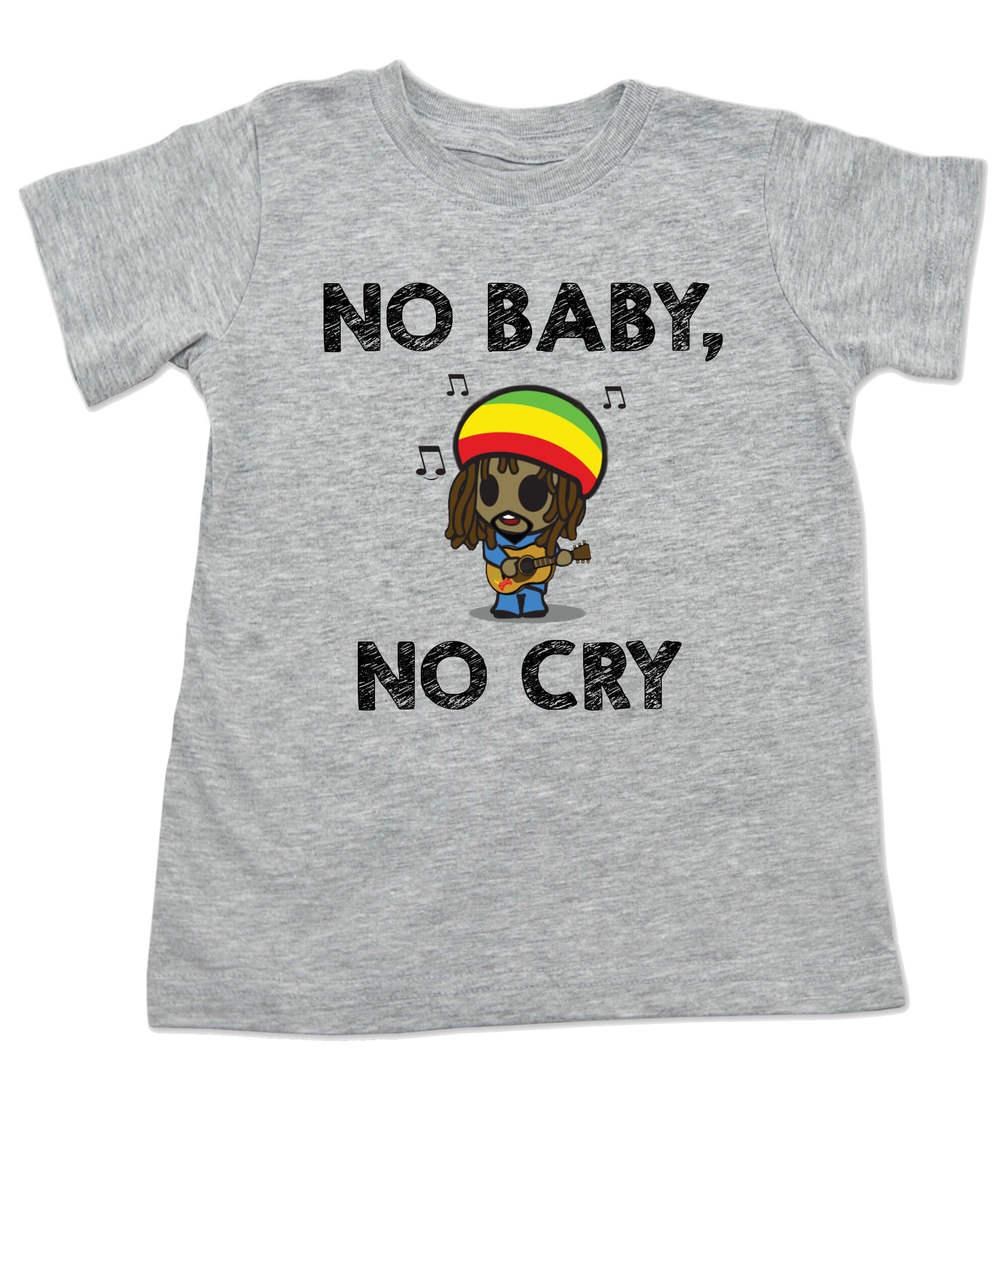 Bob Marley Toddler Shirt No Baby Cry Reggae Music Kid T